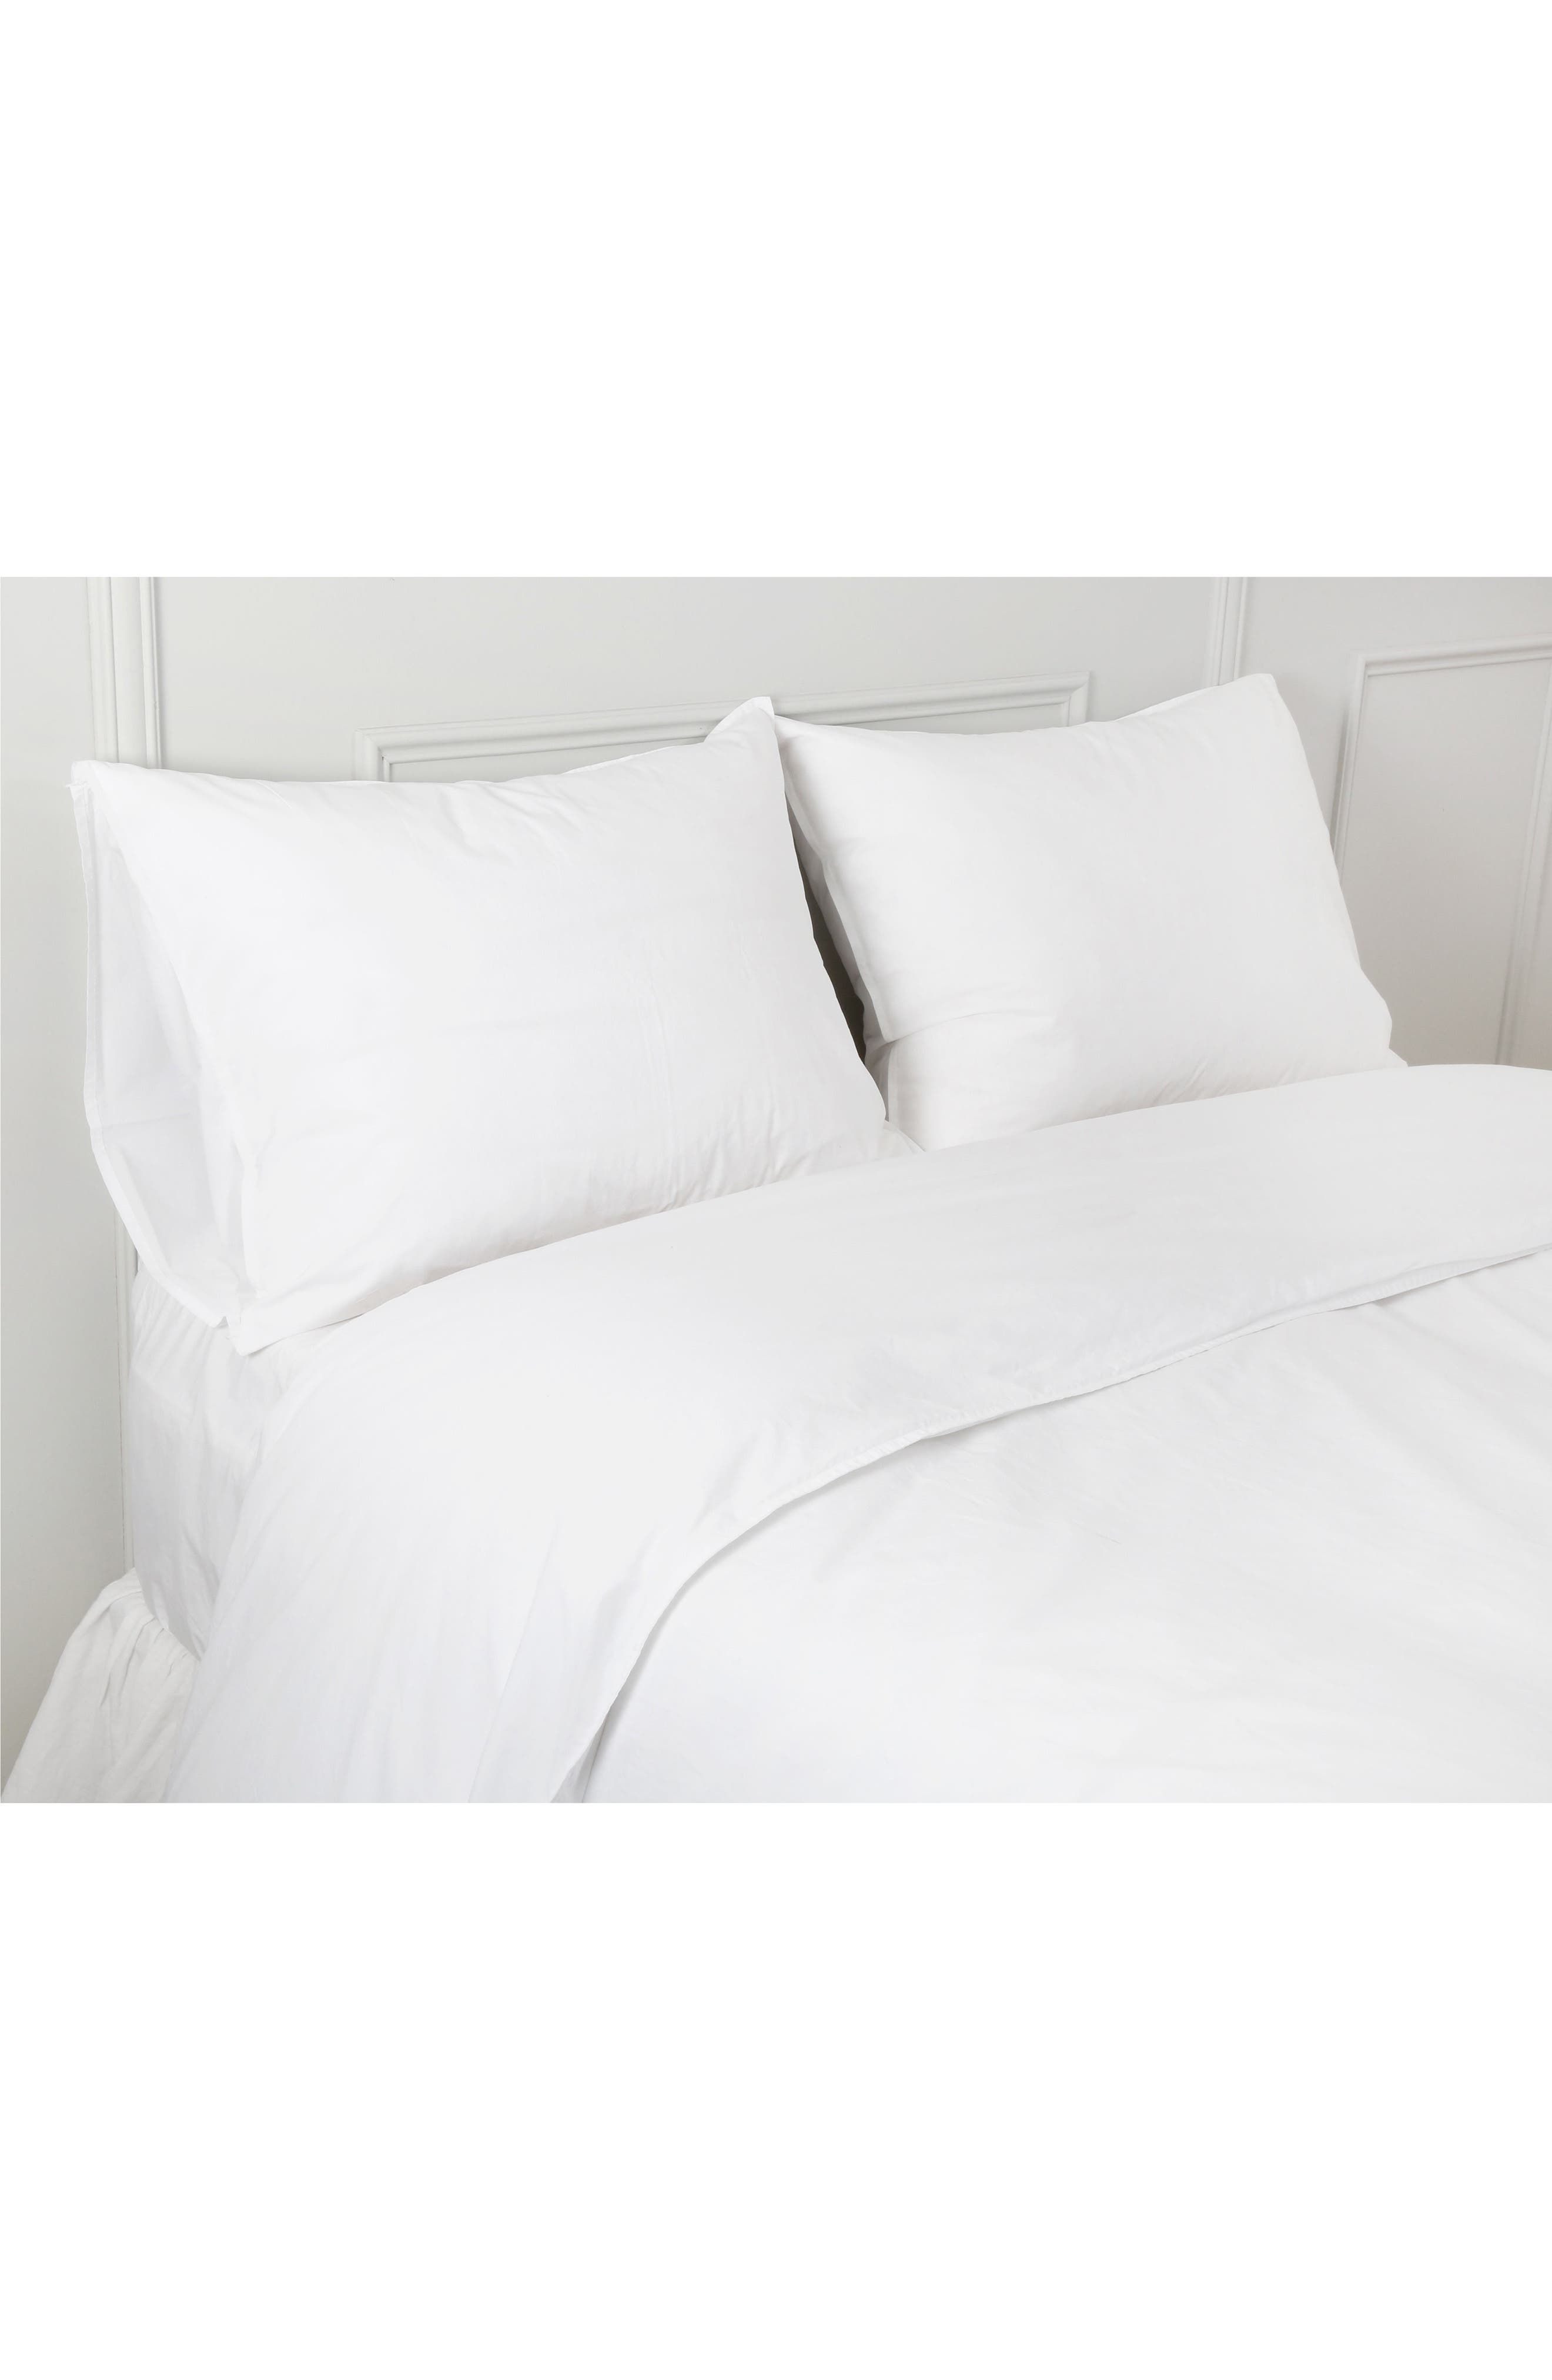 Cotton Percale Sheet Set,                             Main thumbnail 1, color,                             White